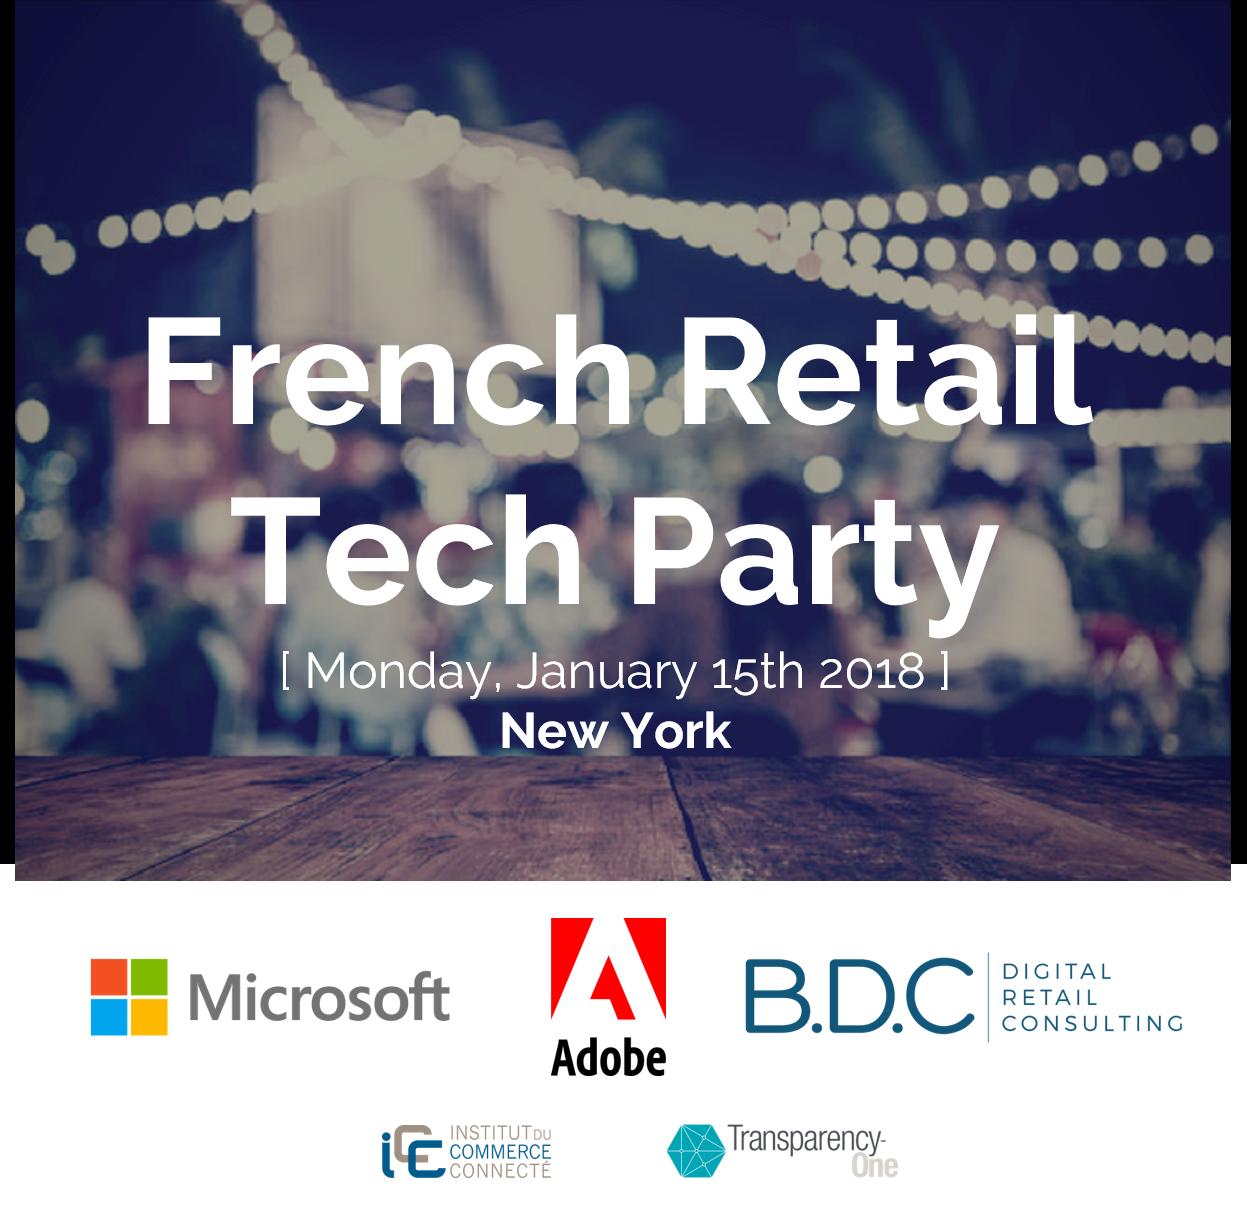 B.D.C. Microsoft Adobe French Retail Tech Party NRF2018 - B.D.C., Microsoft & Adobe organize the French Retail Tech Party during NRF 2018